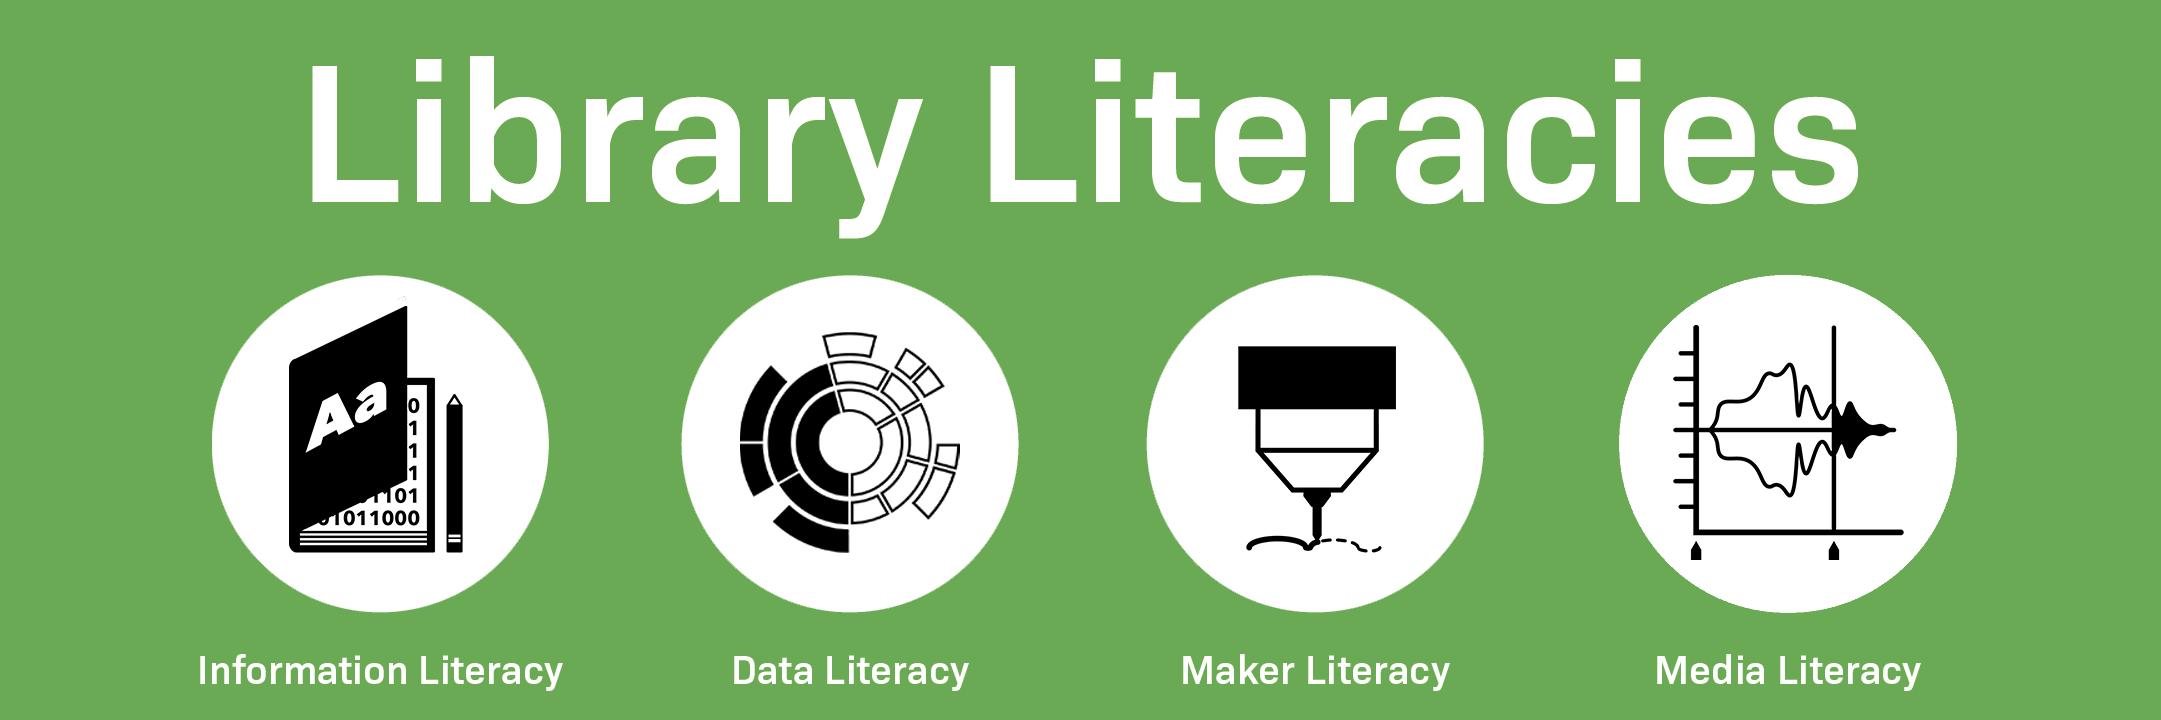 Library Literacies